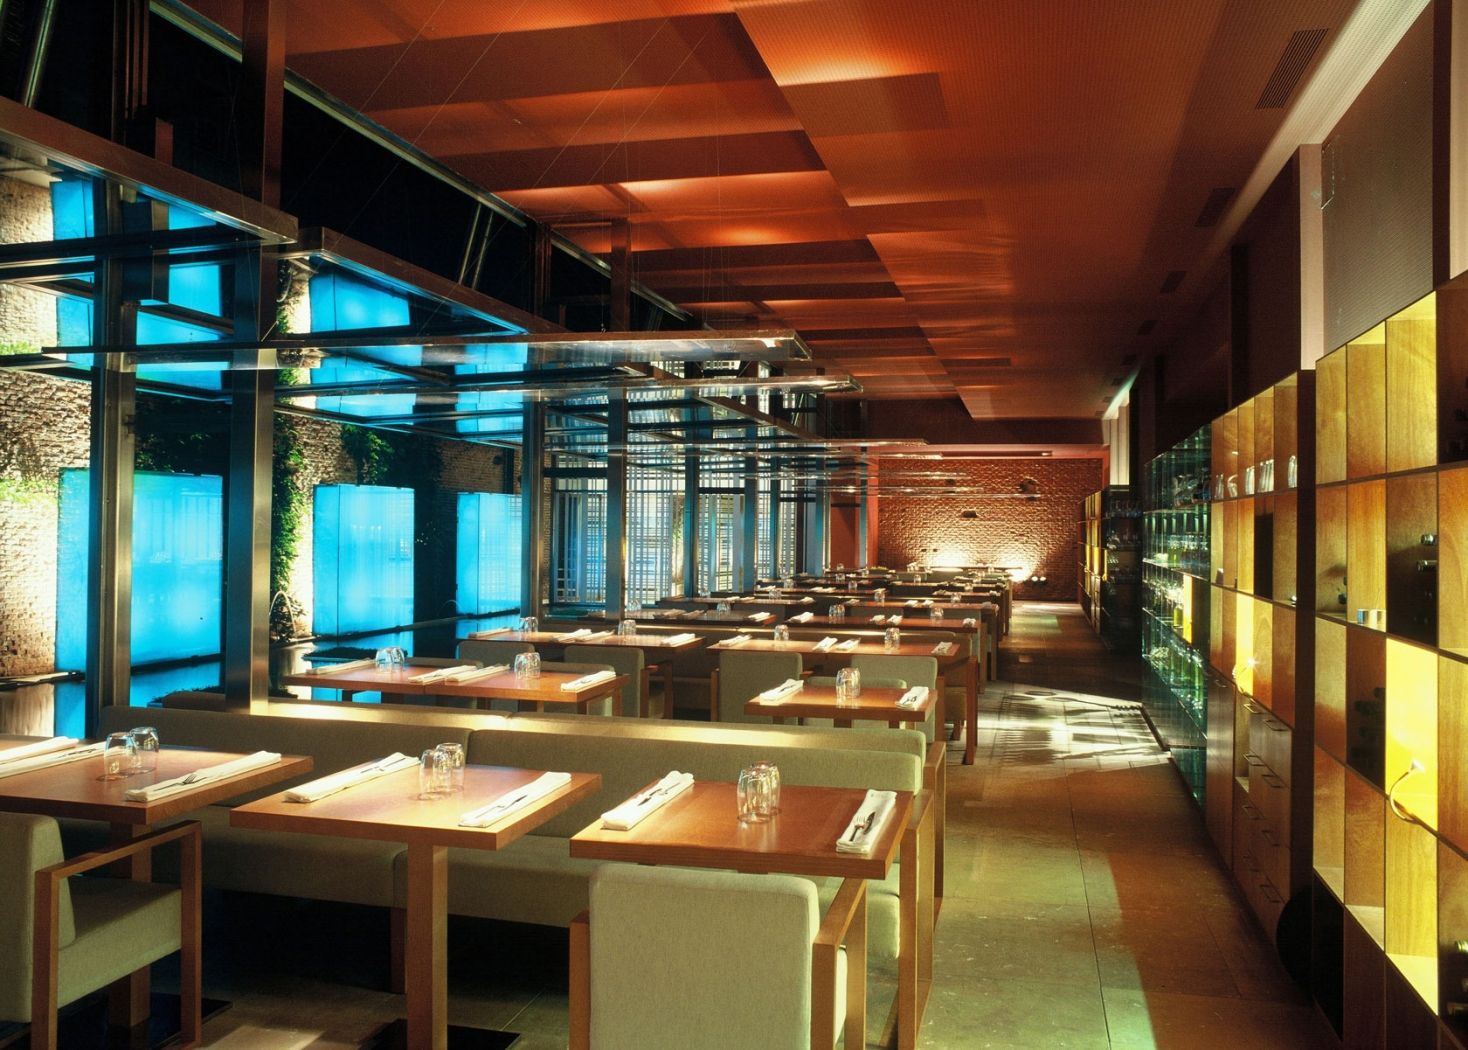 Restaurante pandelujo interiorismo dani freixes for Proyecto de restaurante pdf